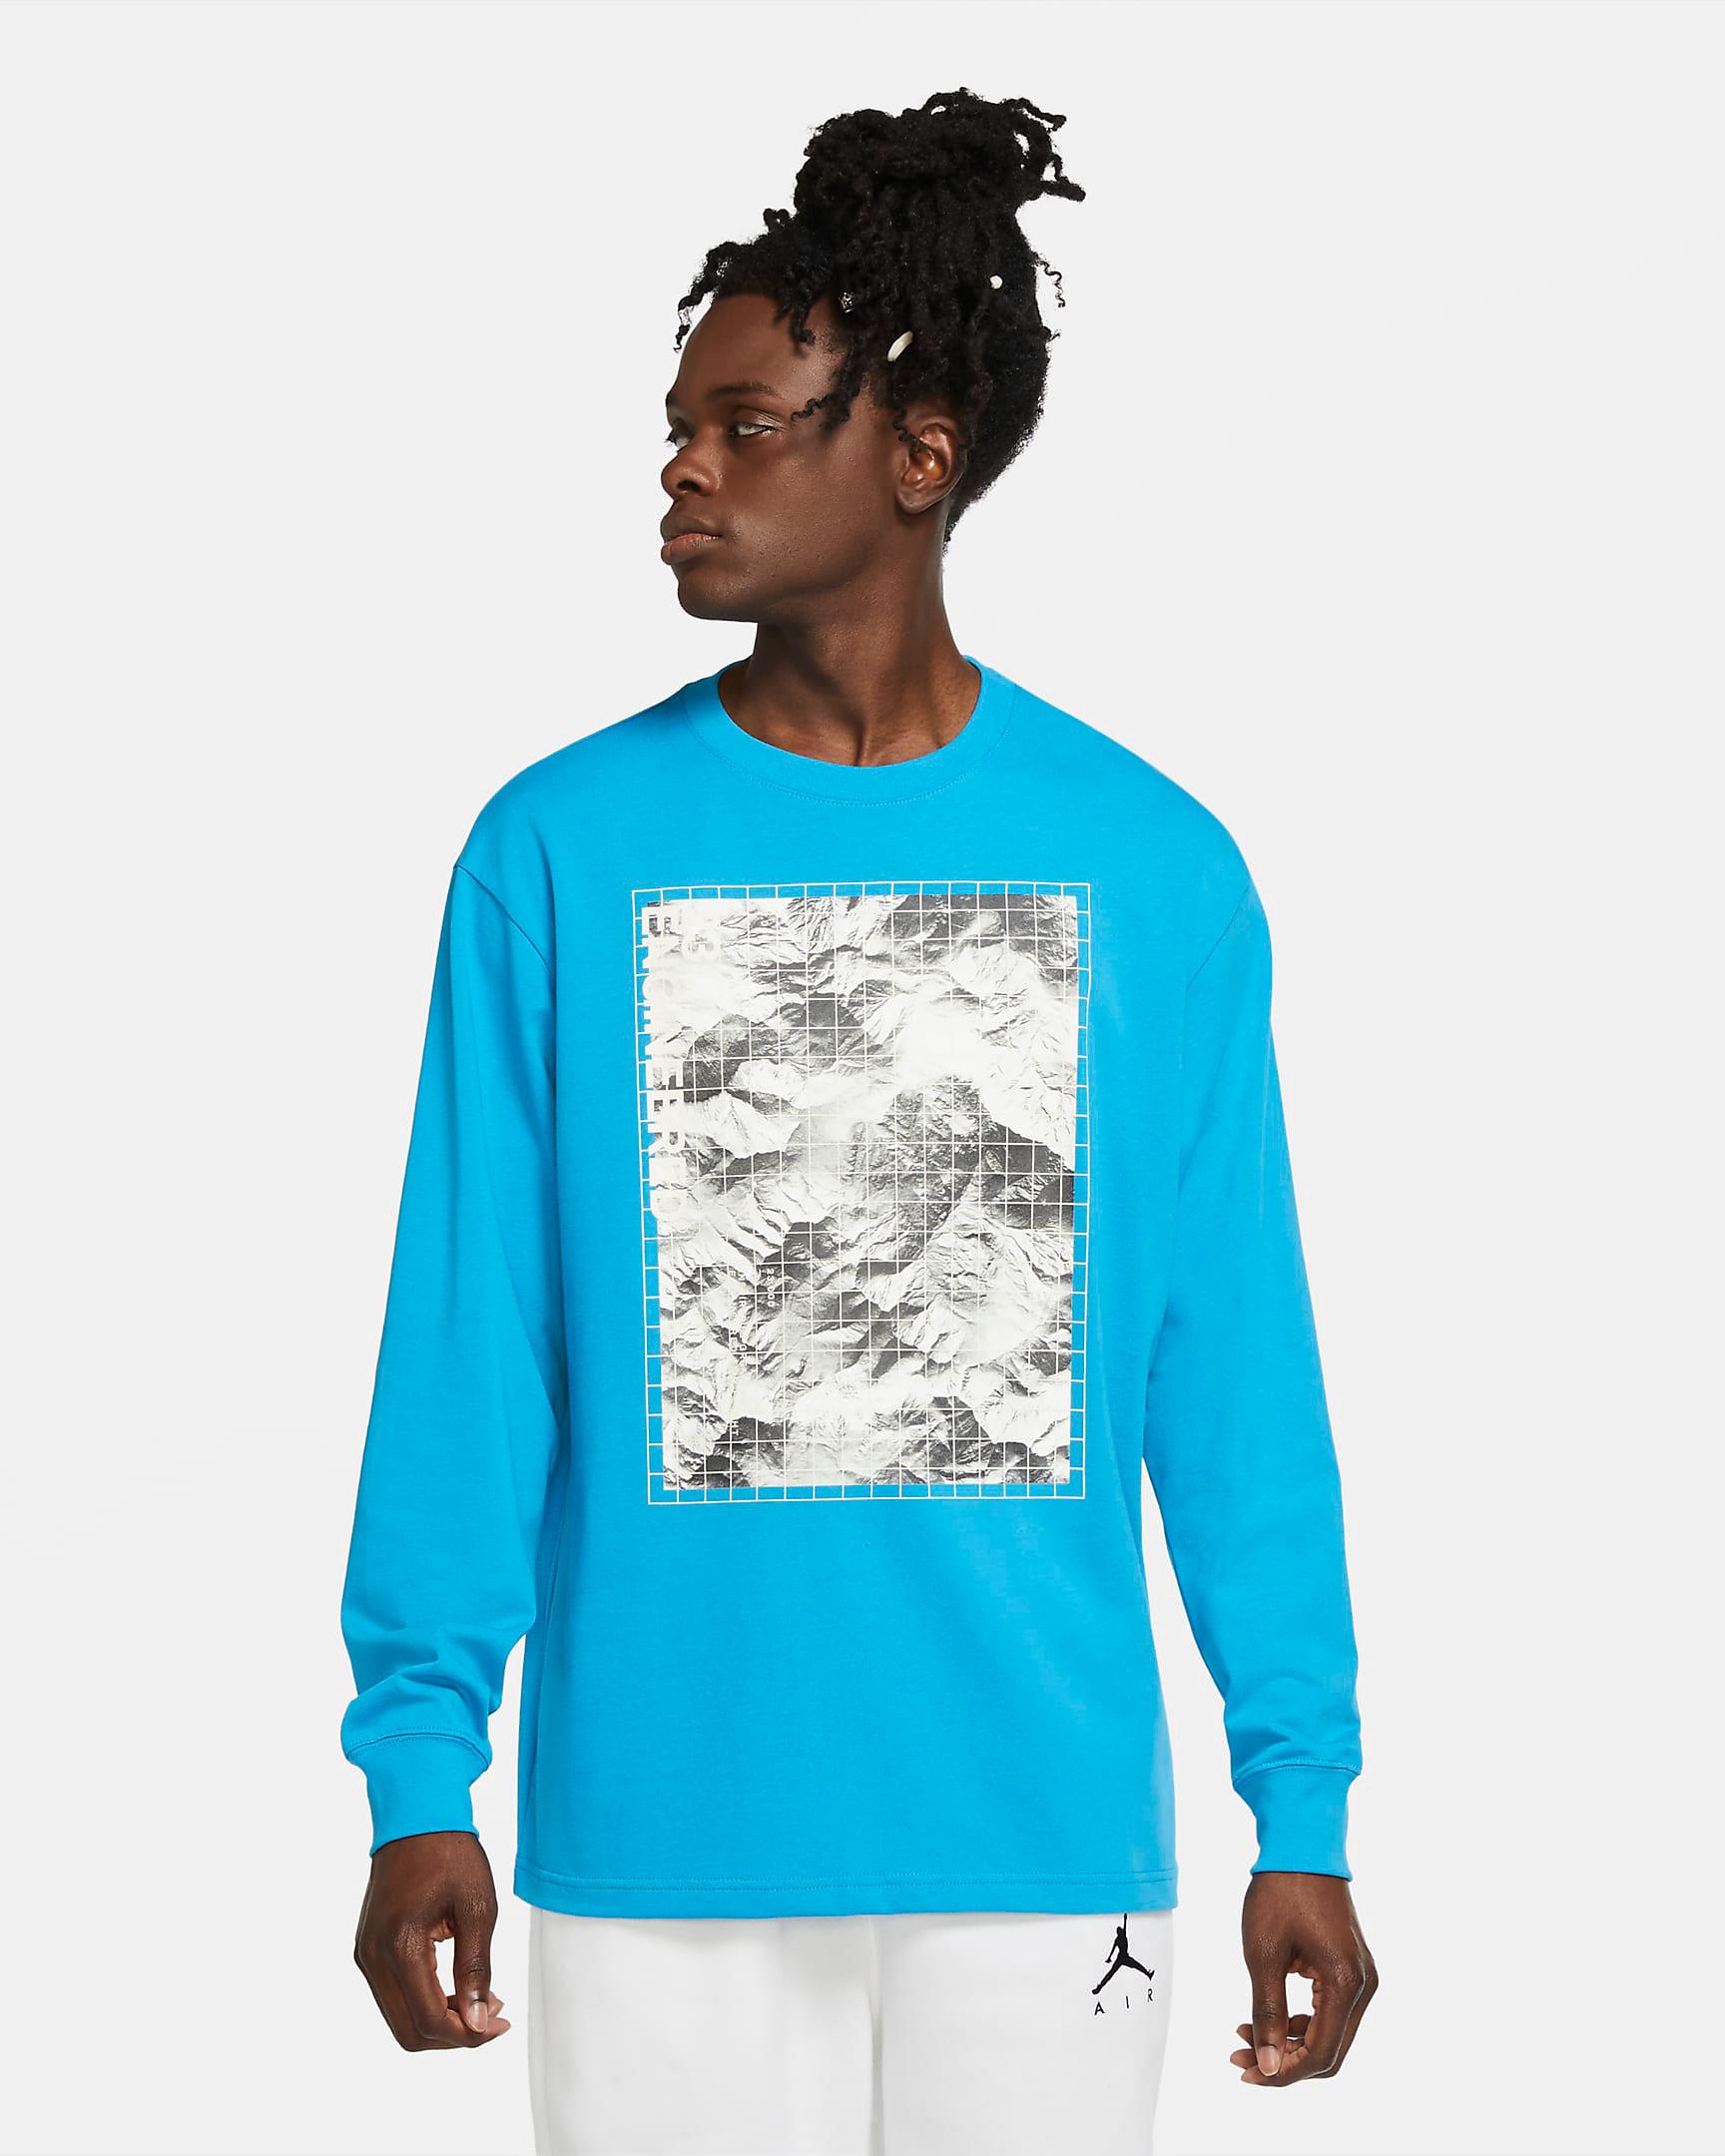 air-jordan-1-low-laser-blue-shirt-1